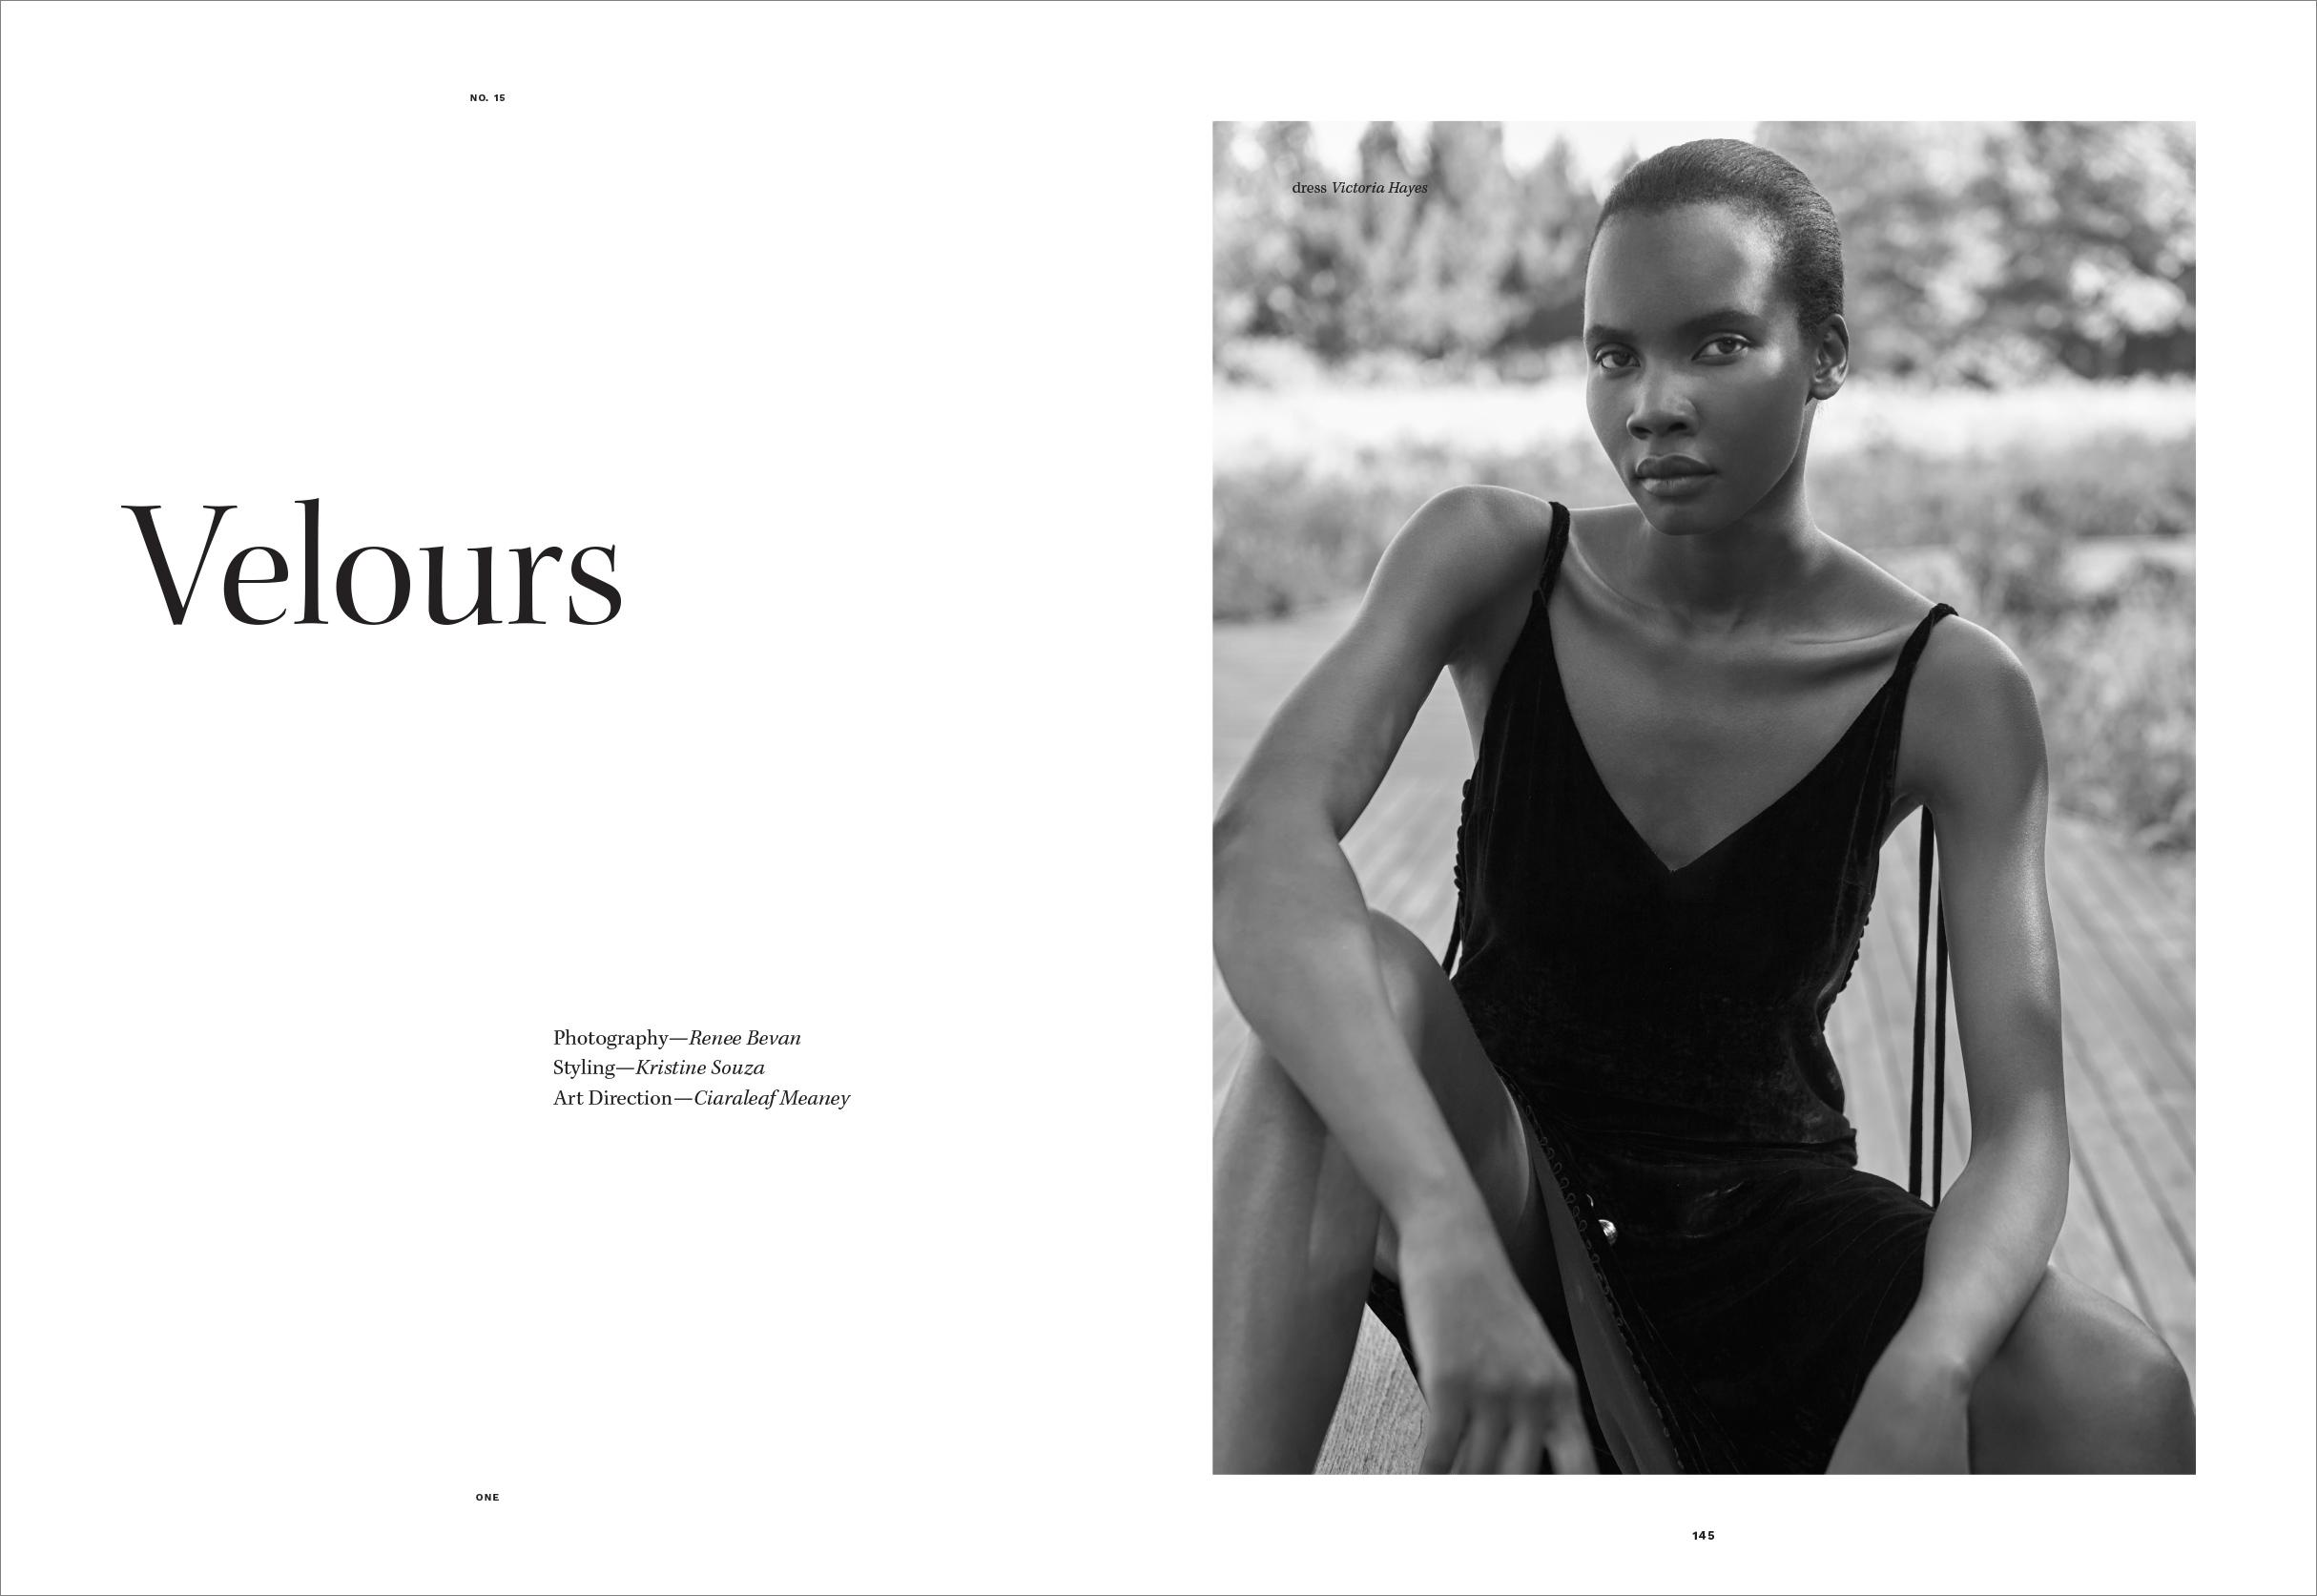 ONE_Magazine_No15_Velours1.jpg